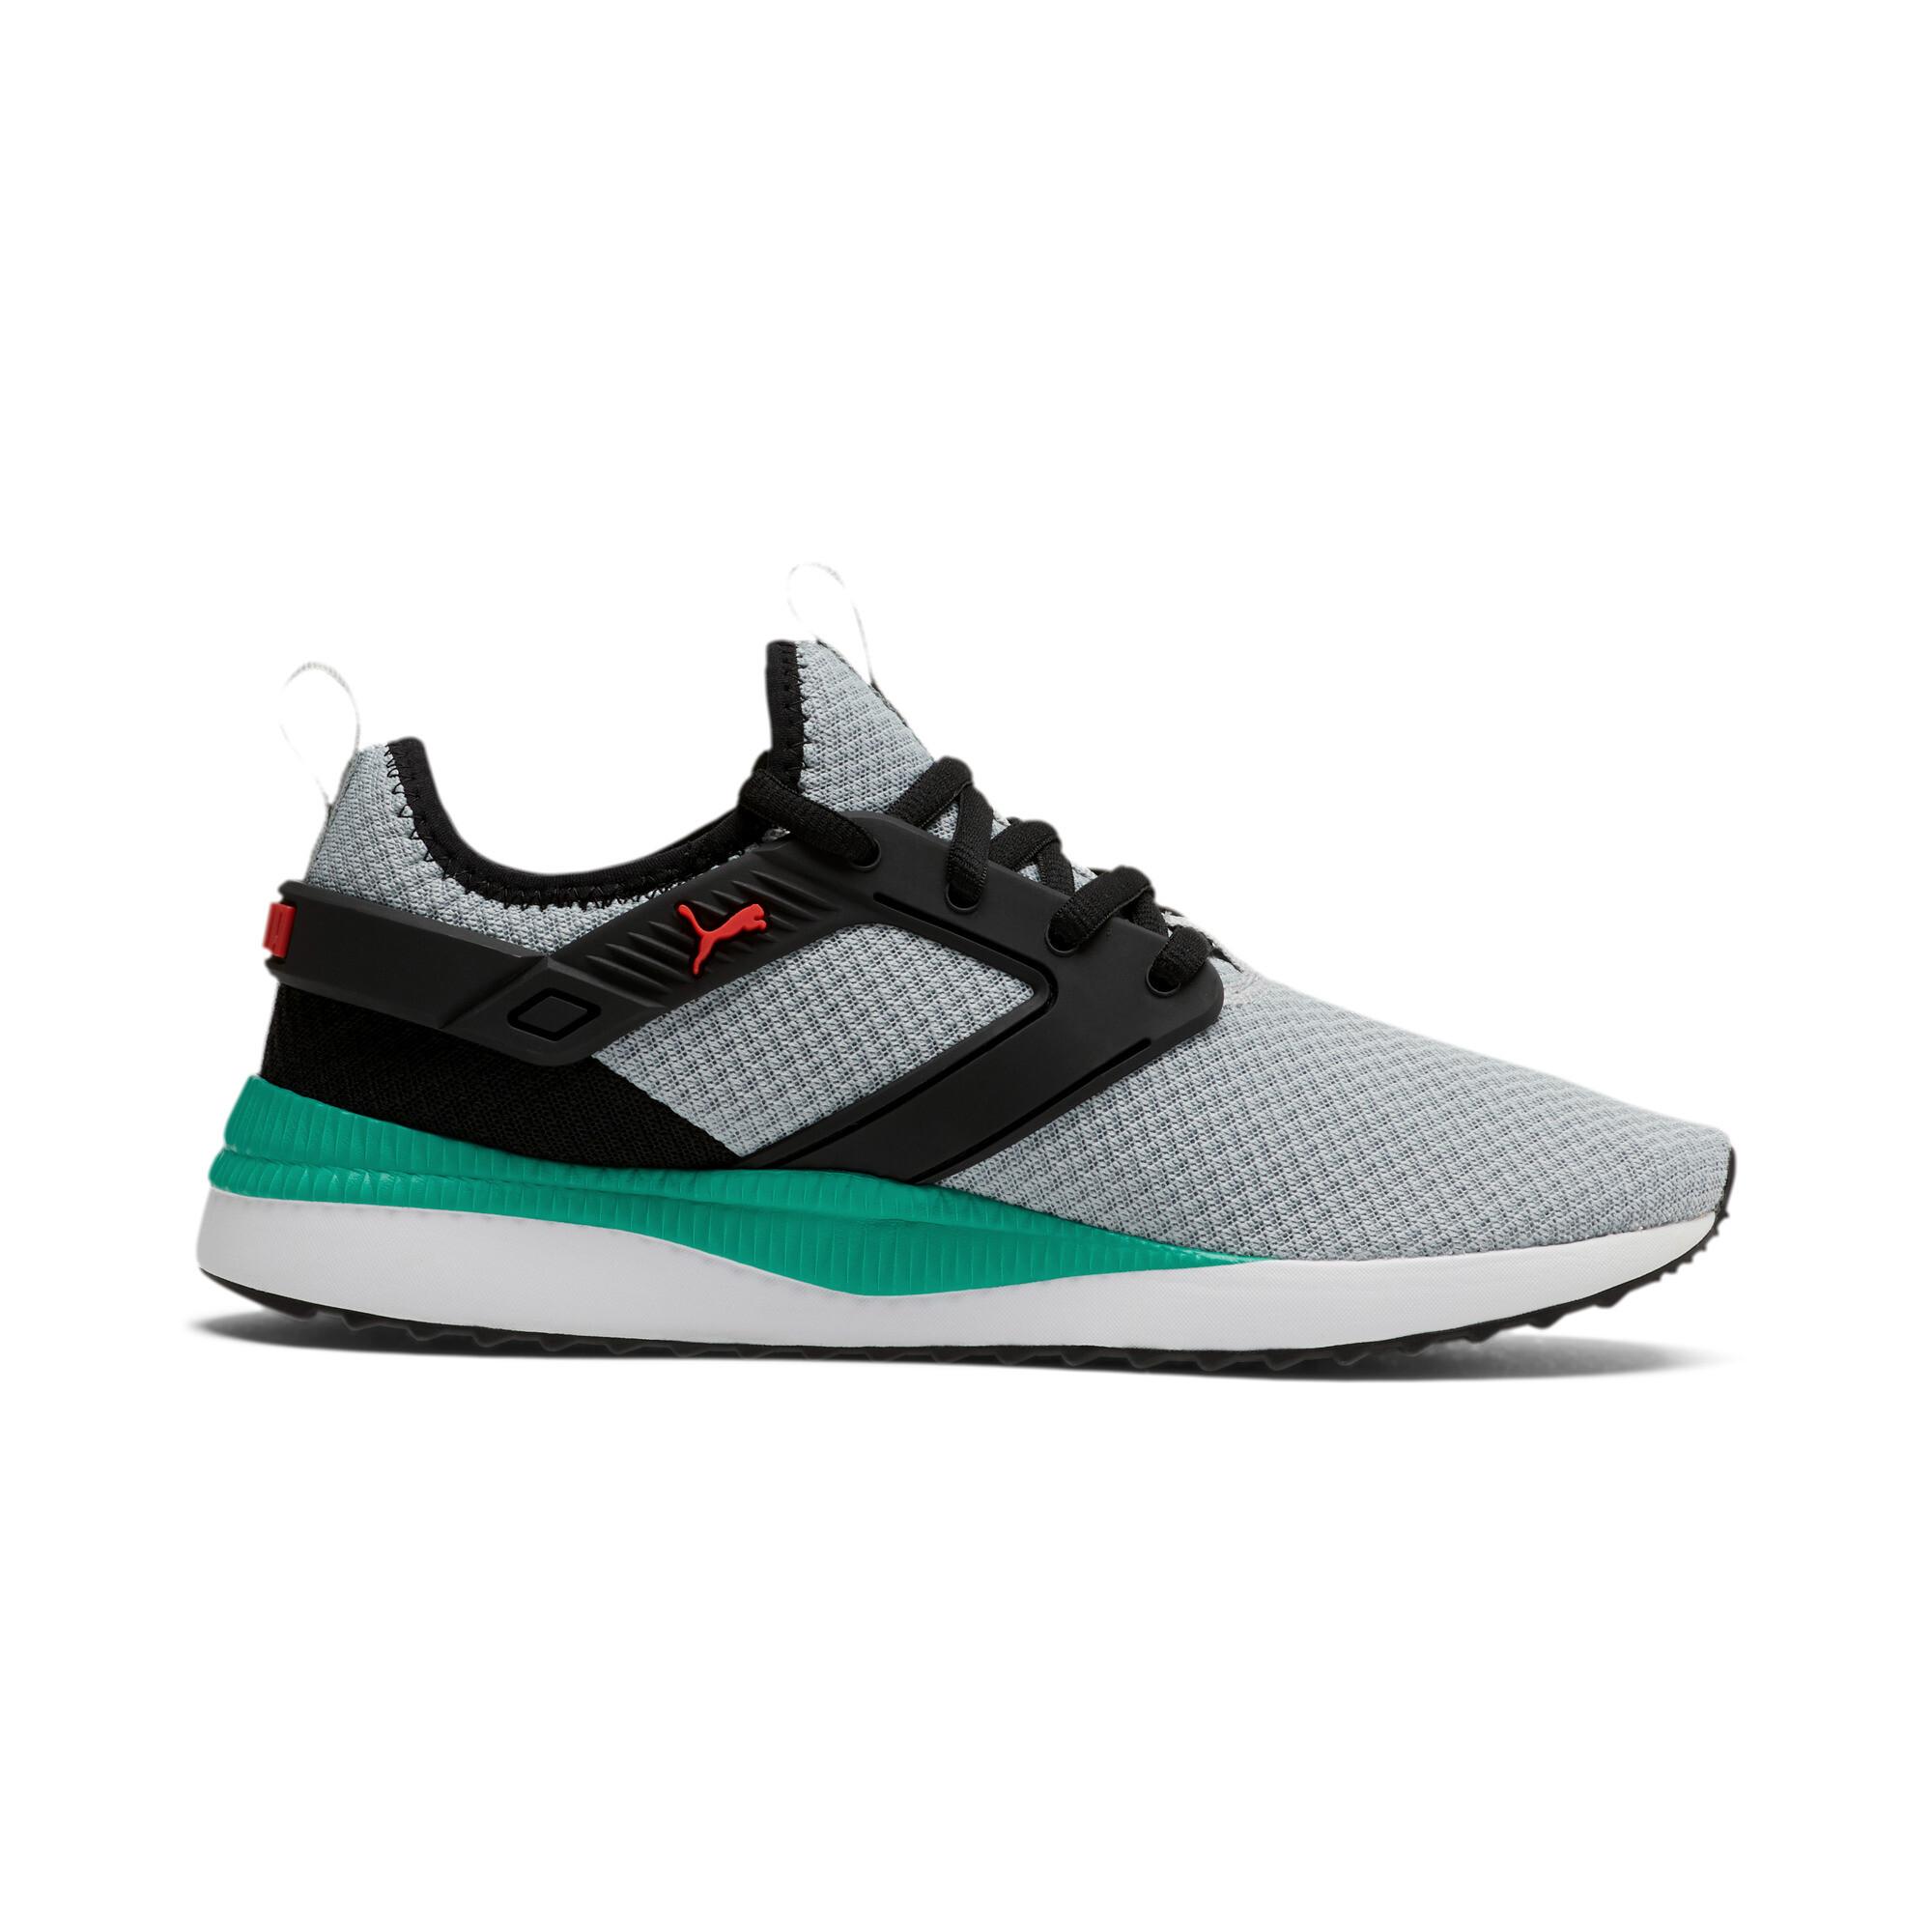 PUMA-Unisex-Pacer-Next-Excel-Mesh-Training-Shoes thumbnail 6